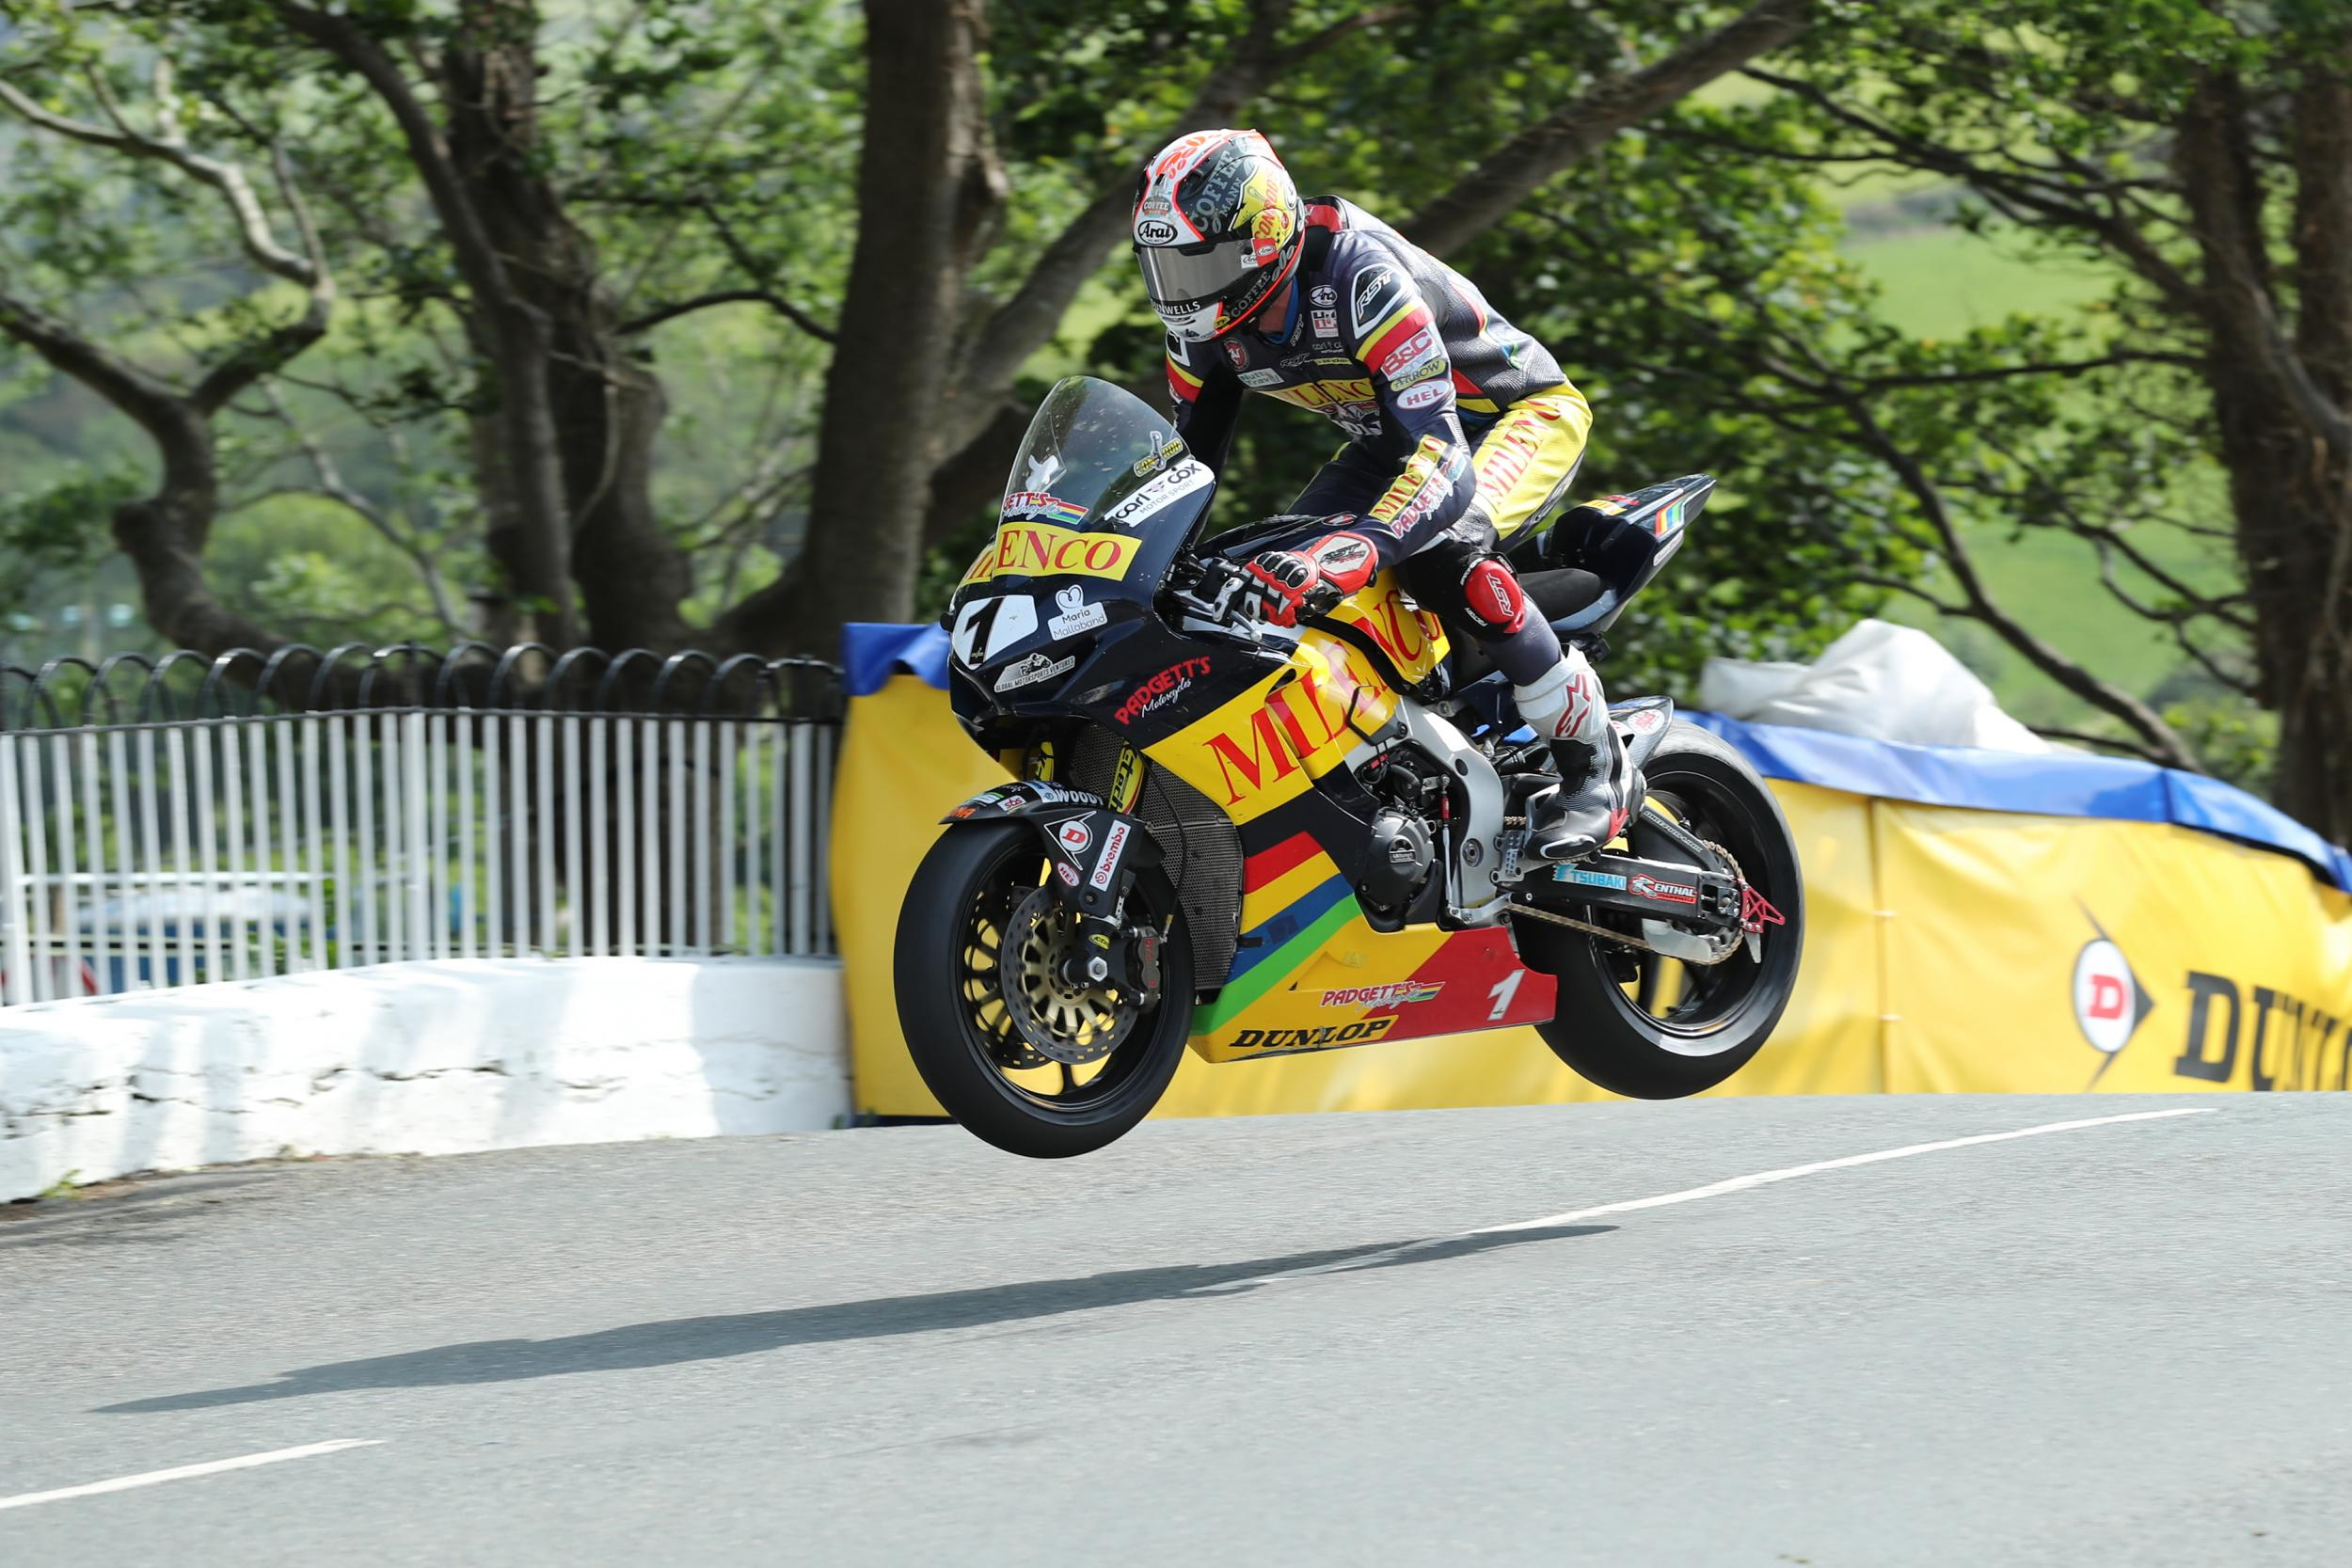 Daley Mathison dead: Isle of Man TT rider dies after crash